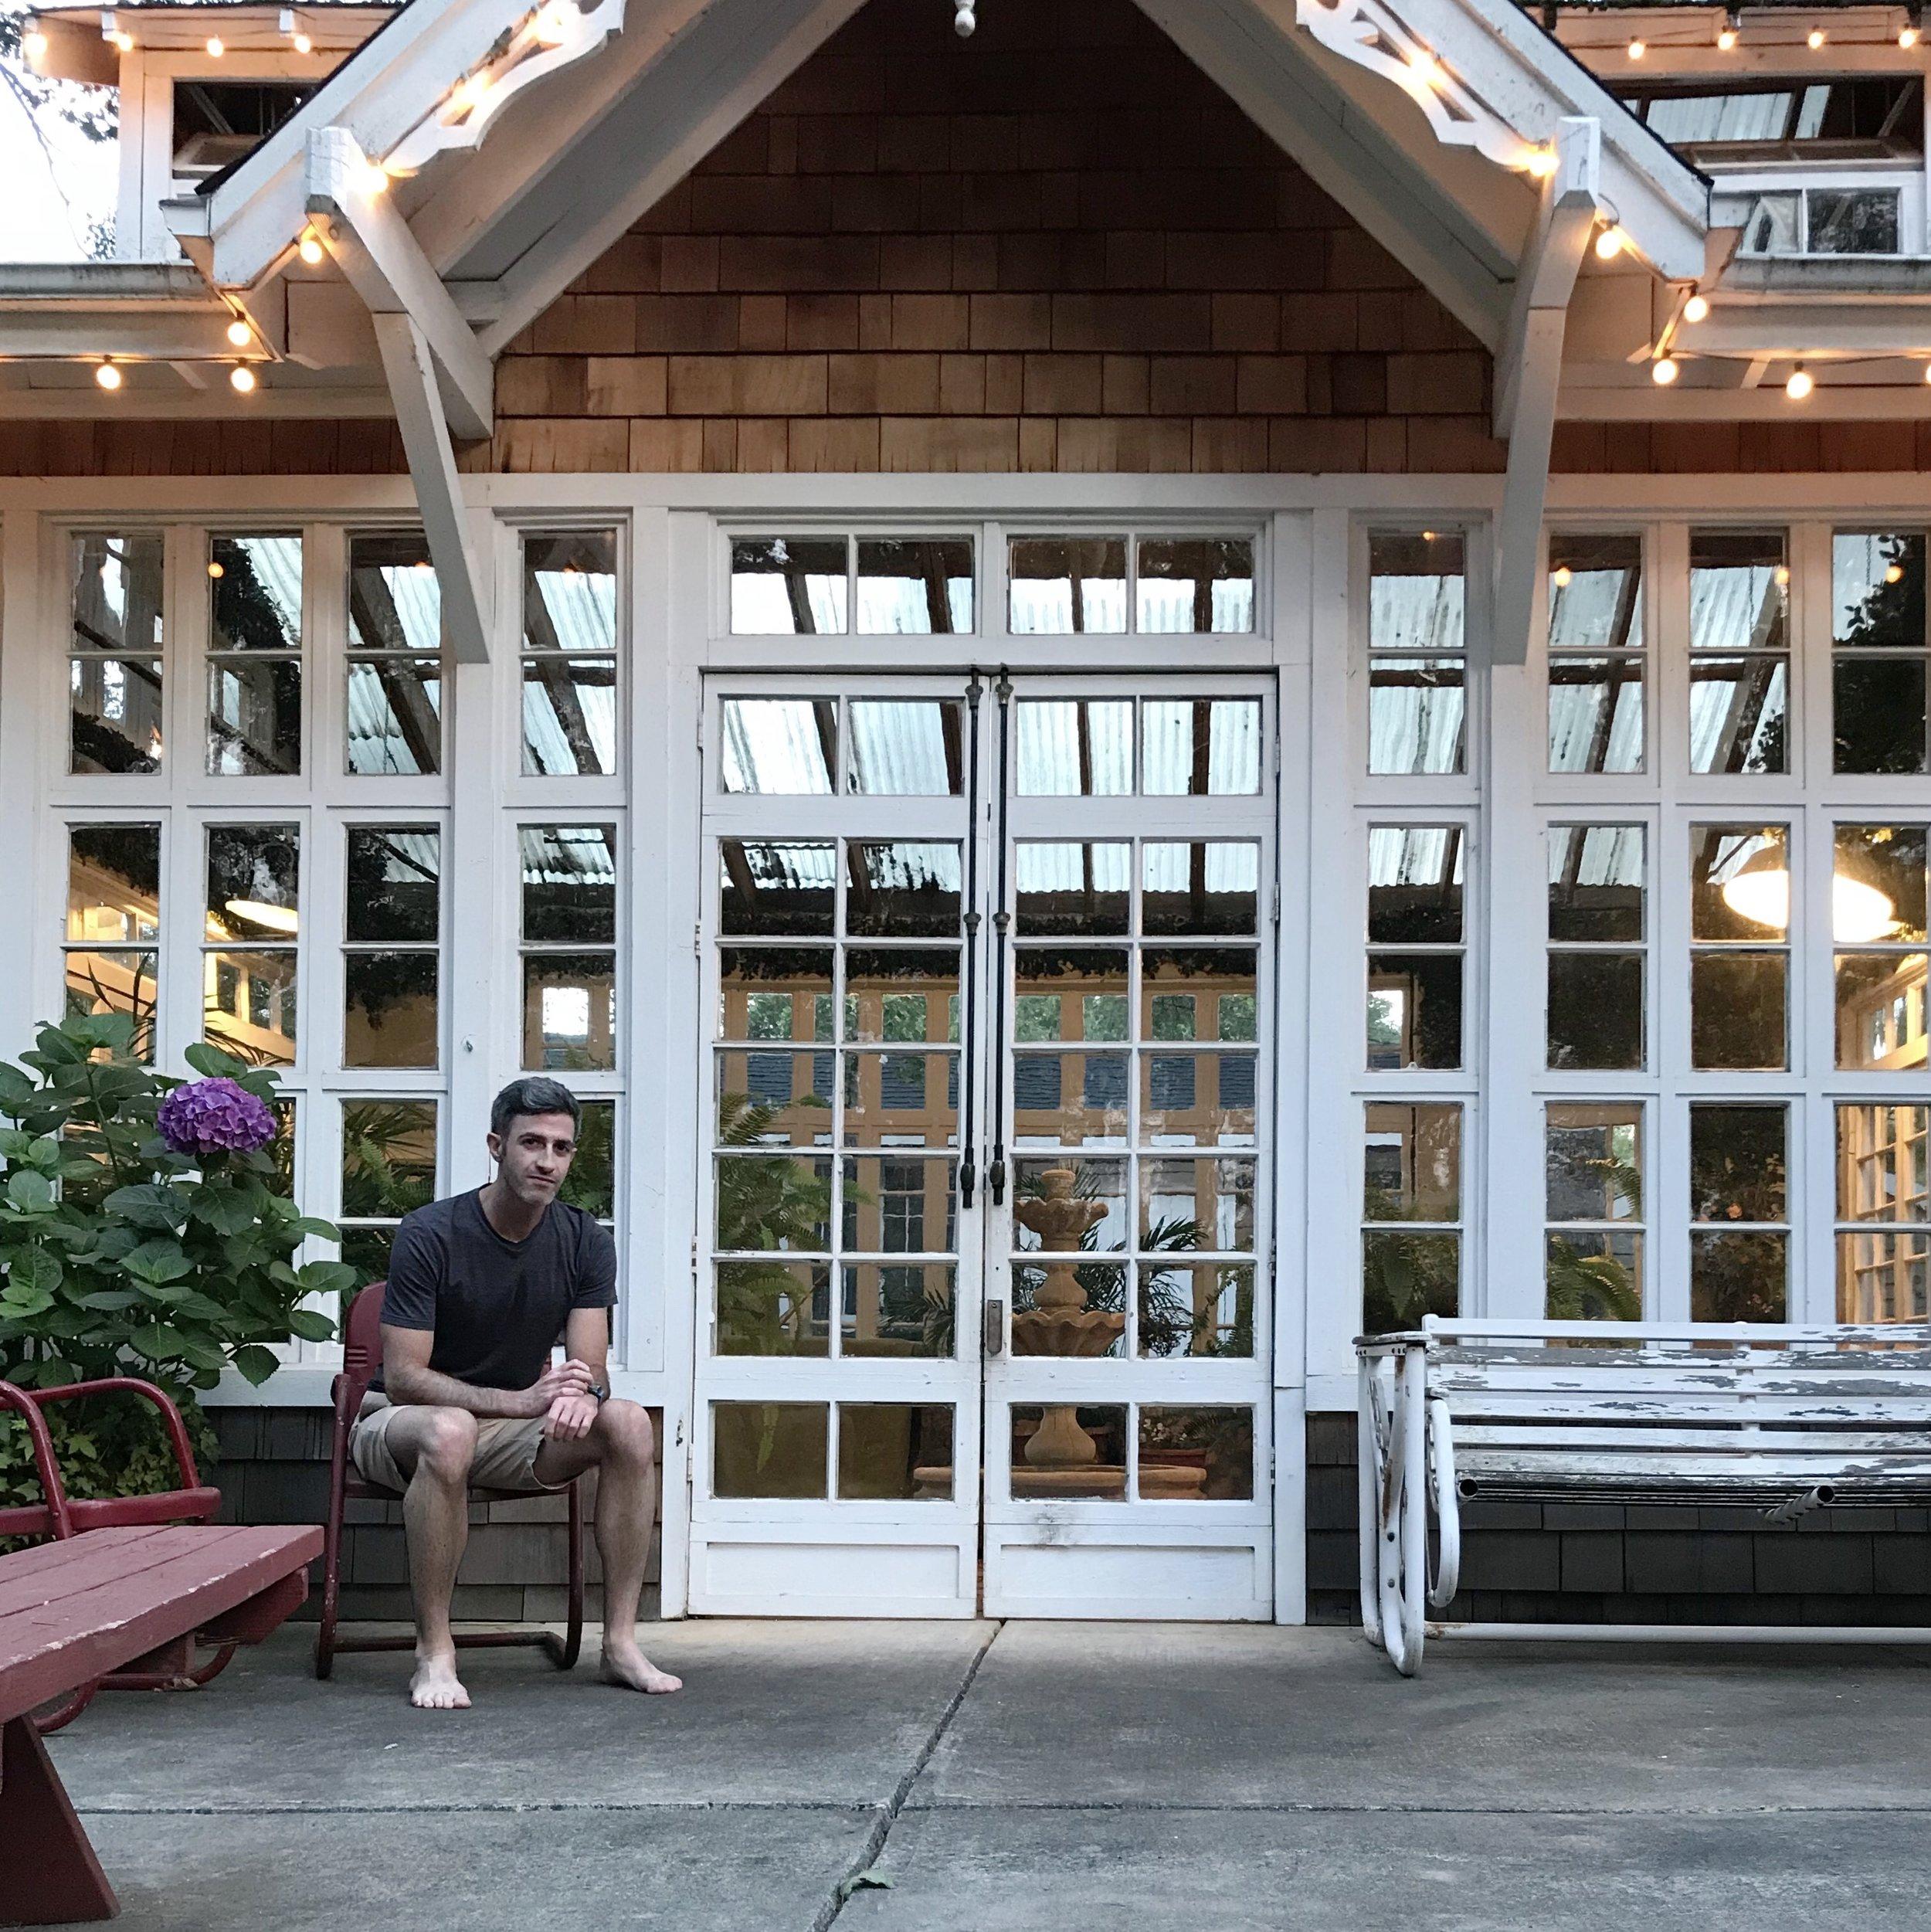 #applewatchselfie: Airbnb Conservatory